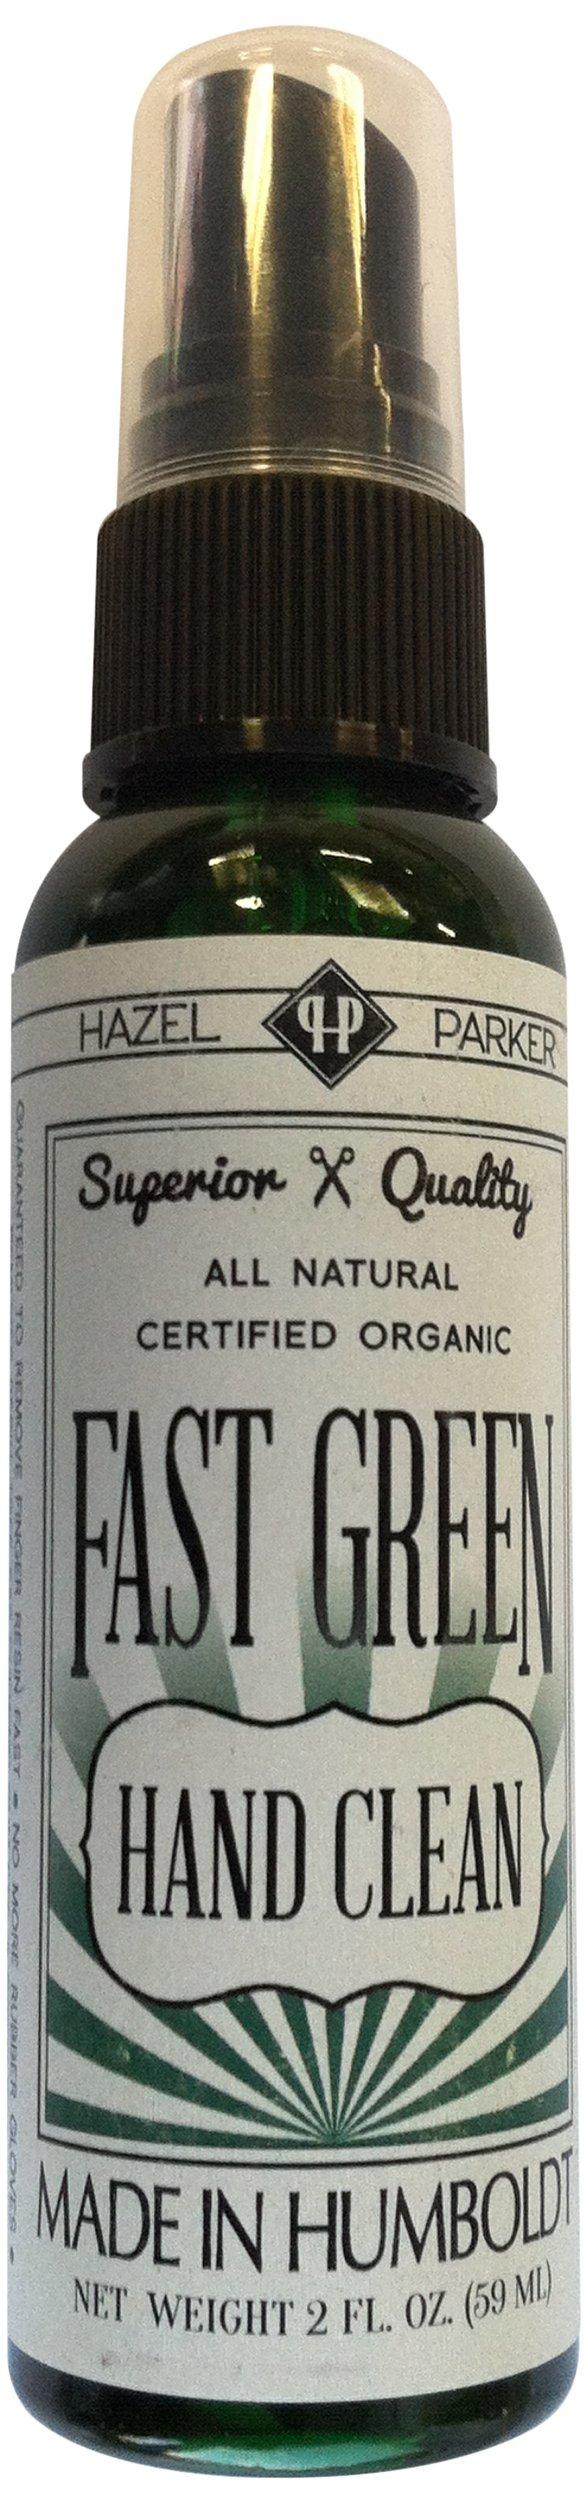 Global Garden Friends Fast Green Hand Clean Spray 2oz